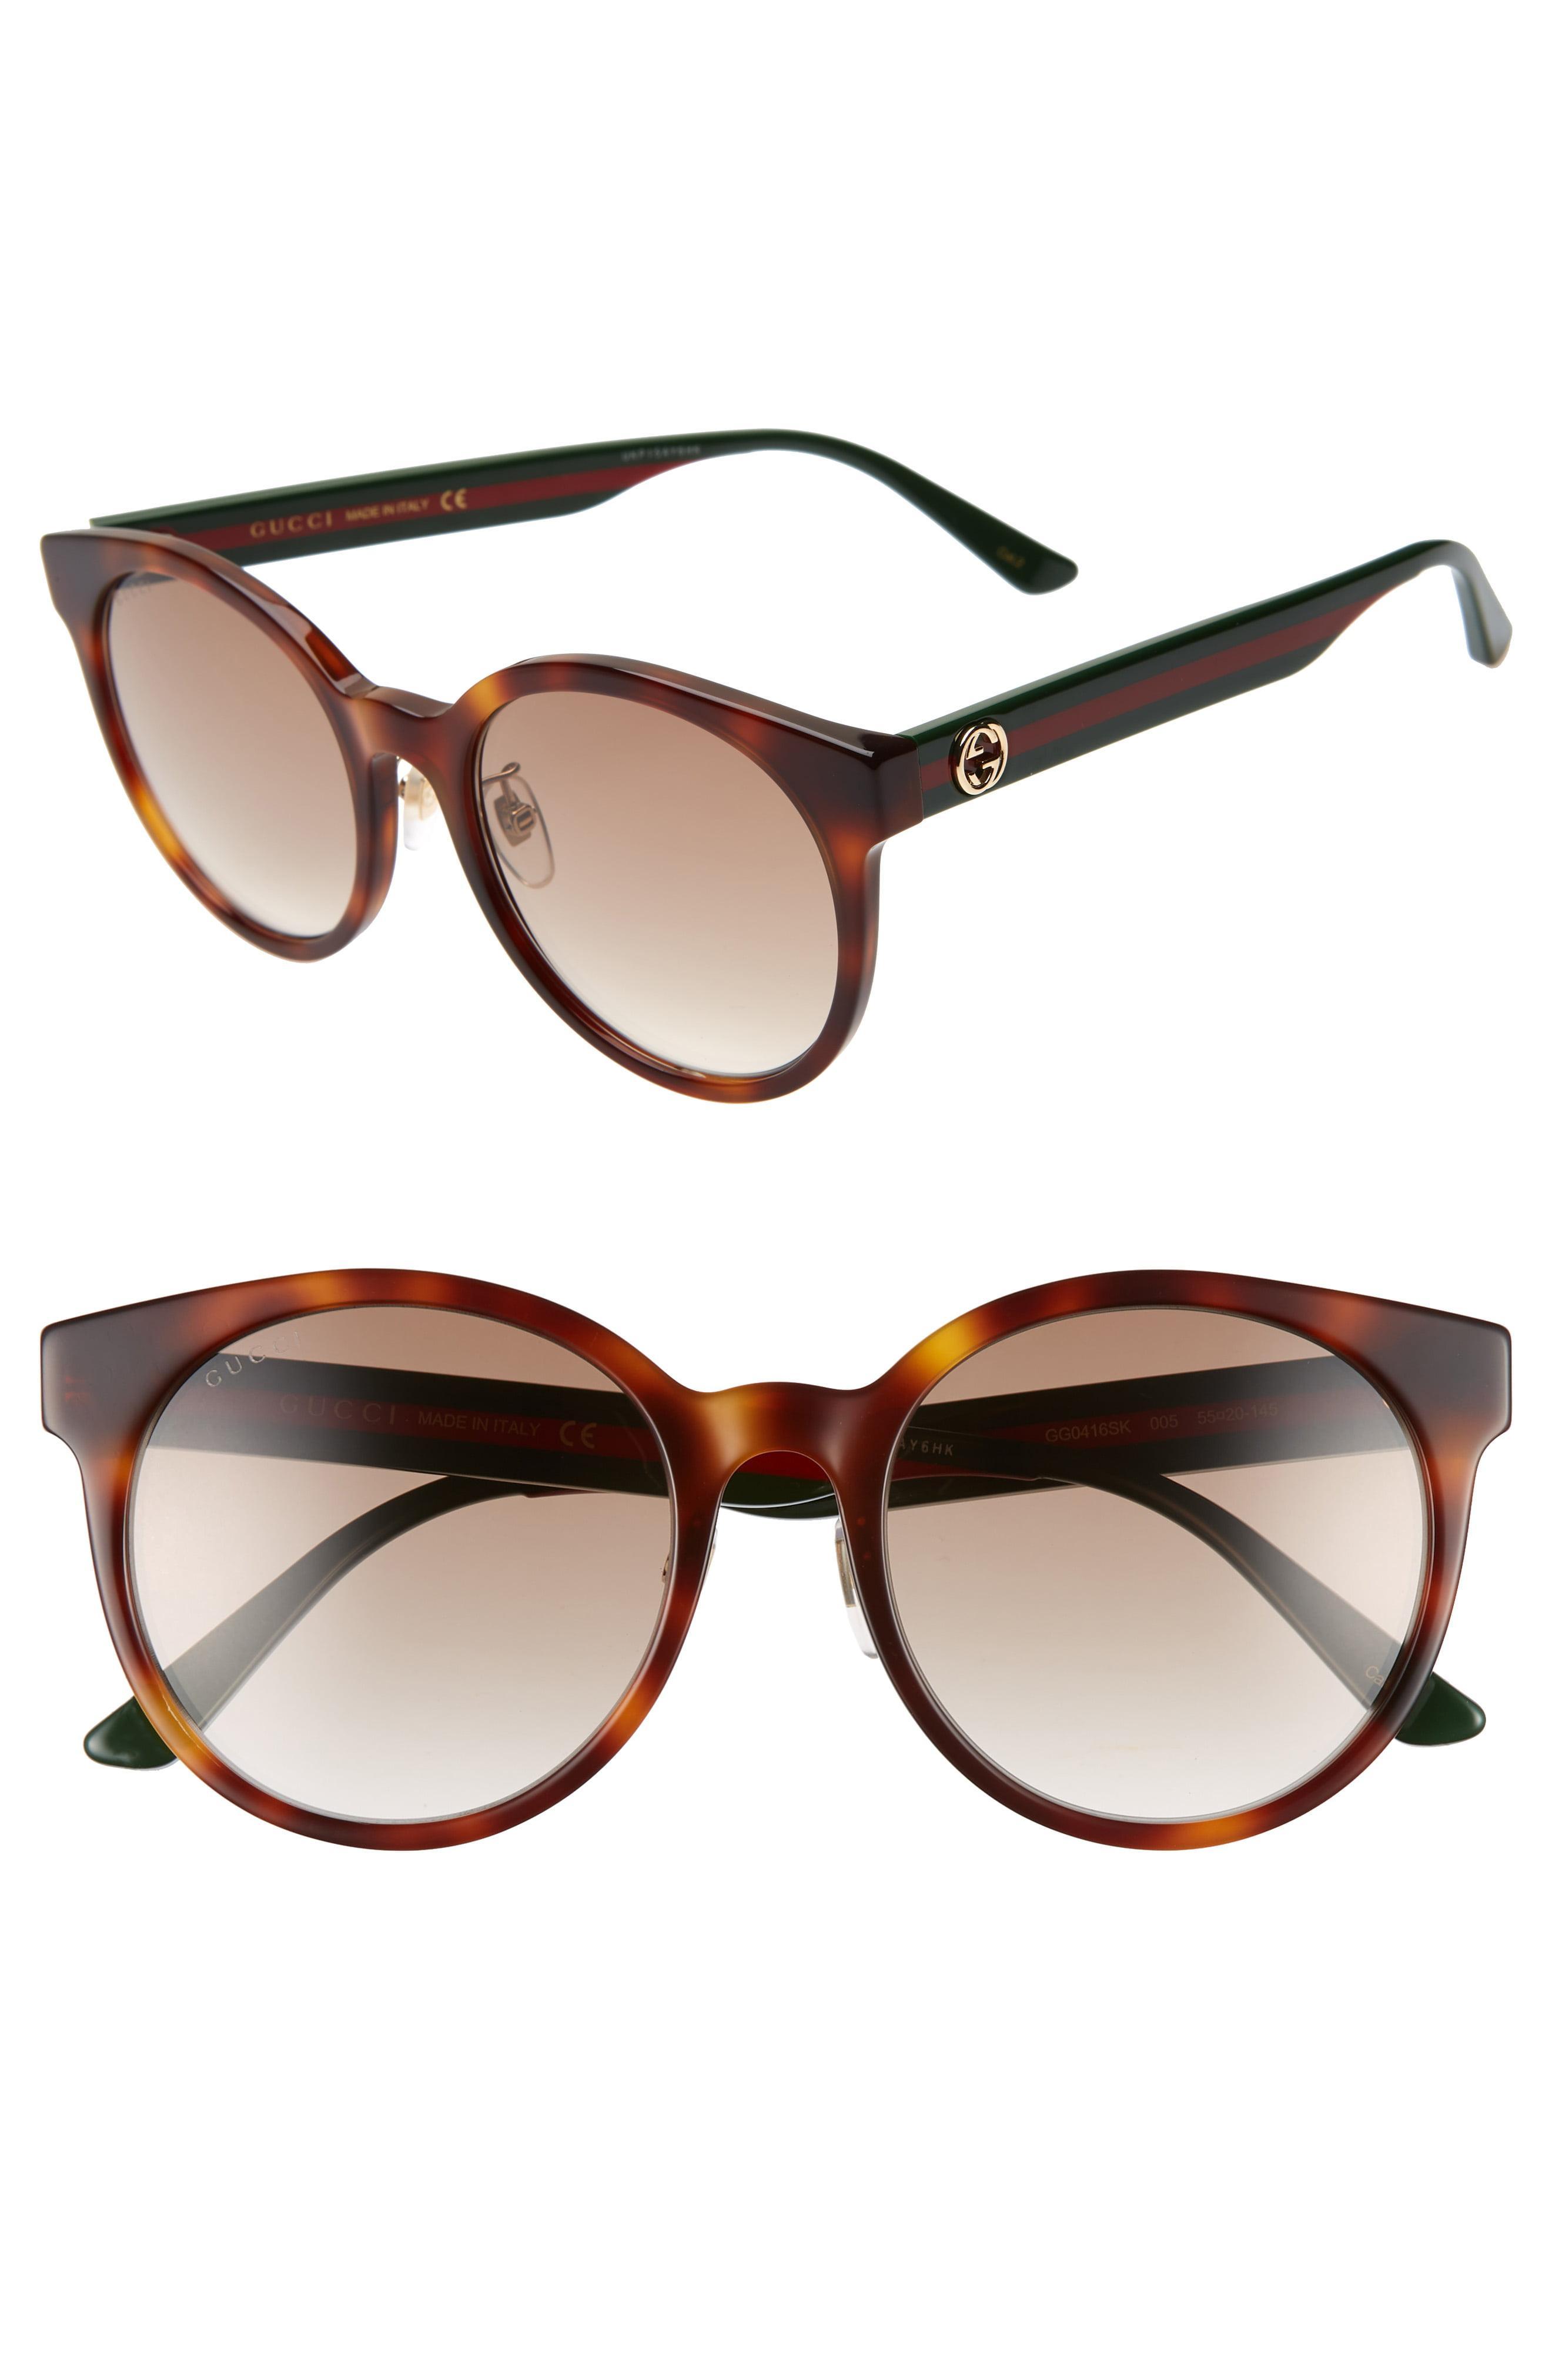 837691f06 Lyst - Gucci 55mm Round Sunglasses - Havana/ Multi/ Brown Gradient ...